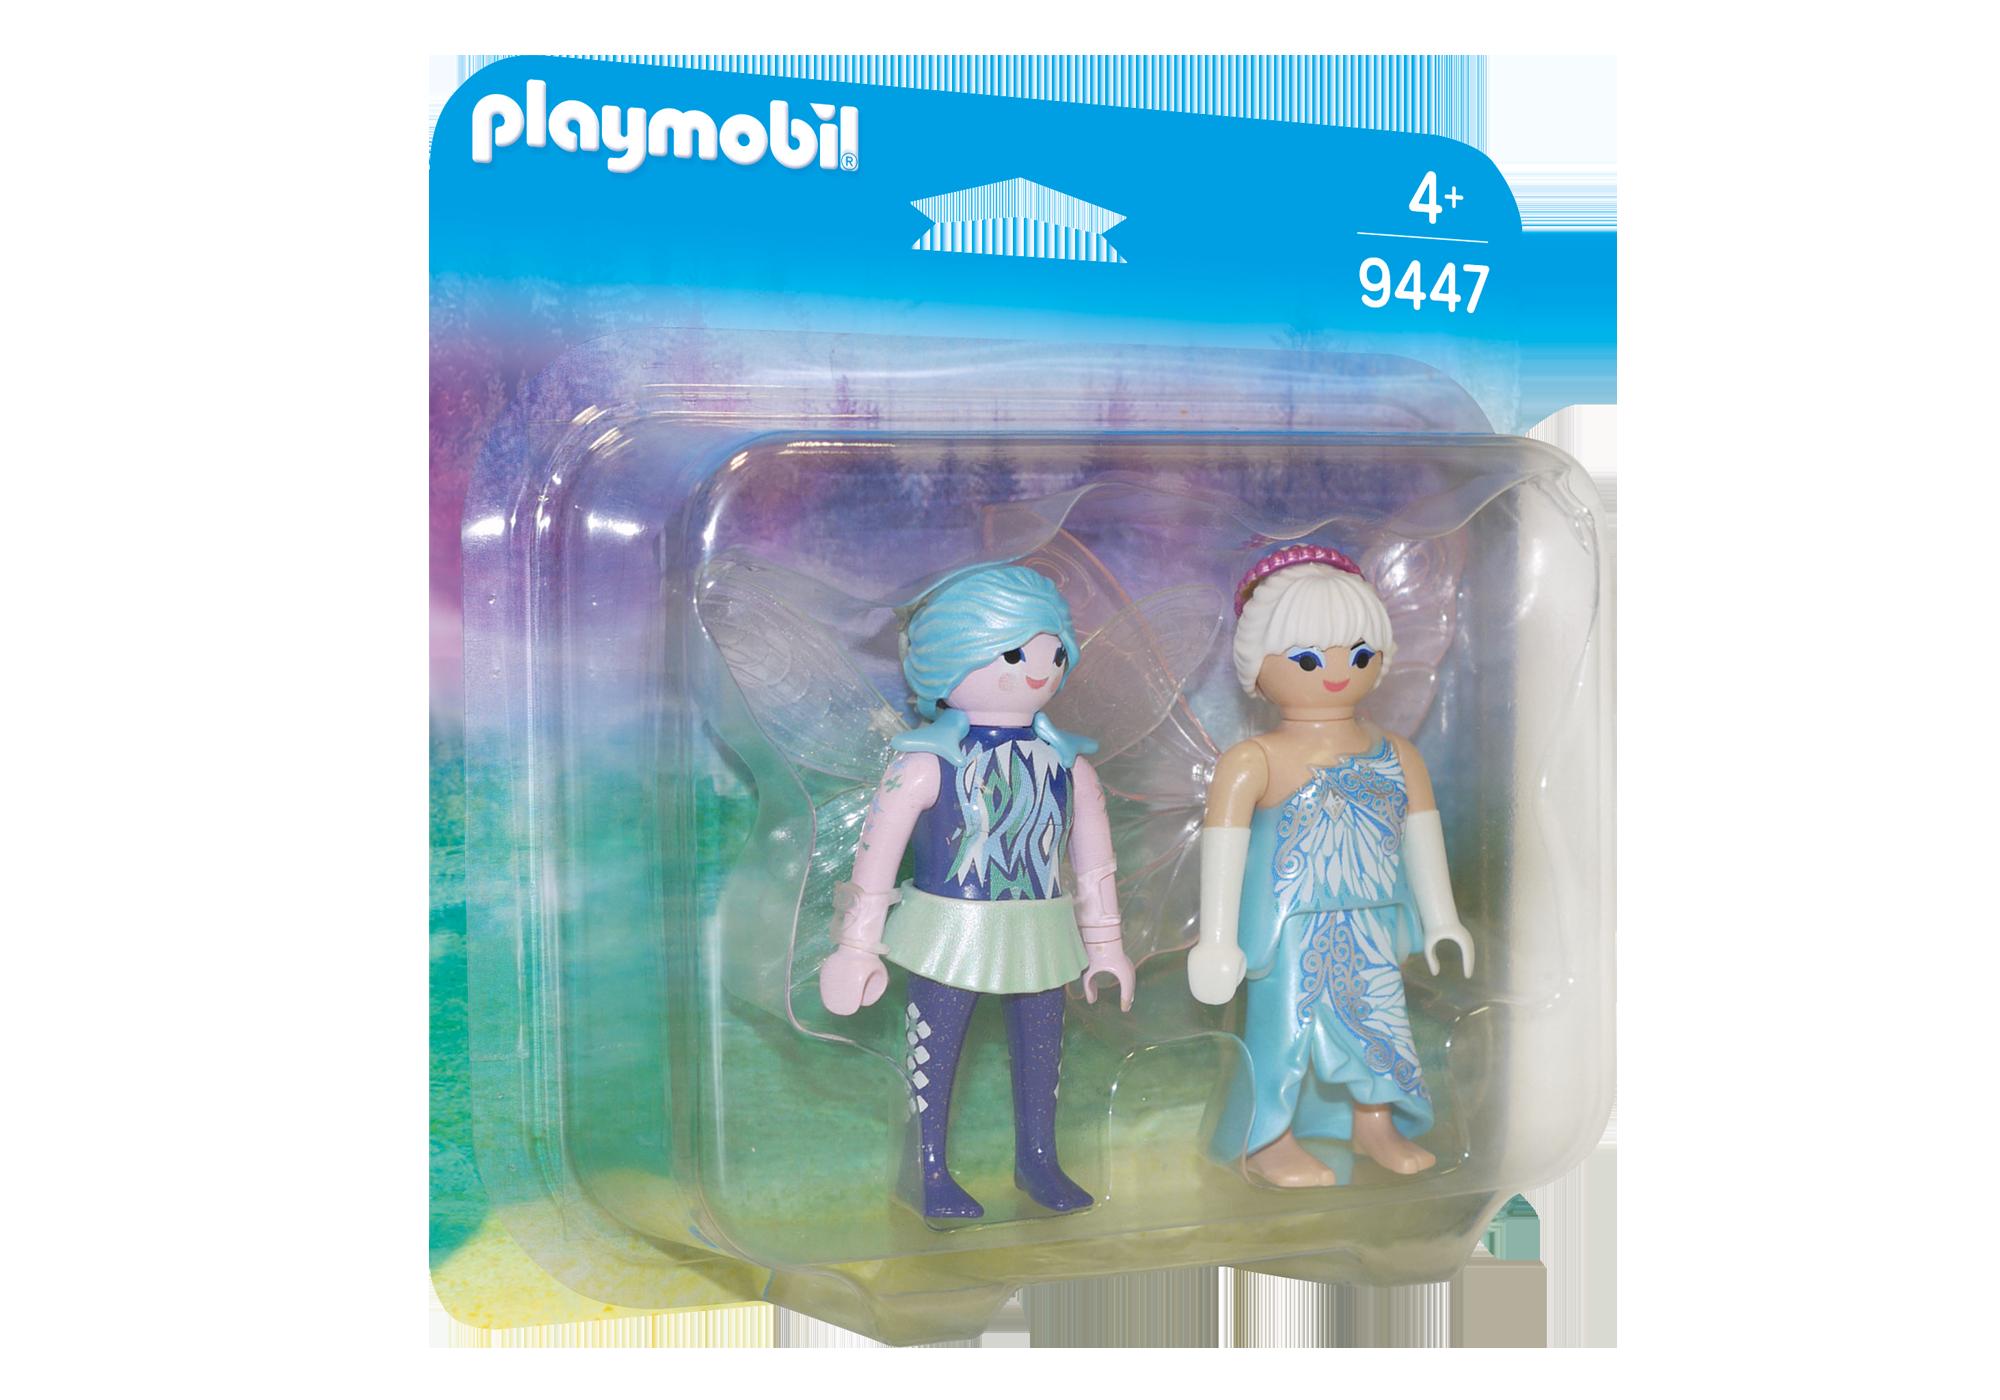 http://media.playmobil.com/i/playmobil/9447_product_box_front